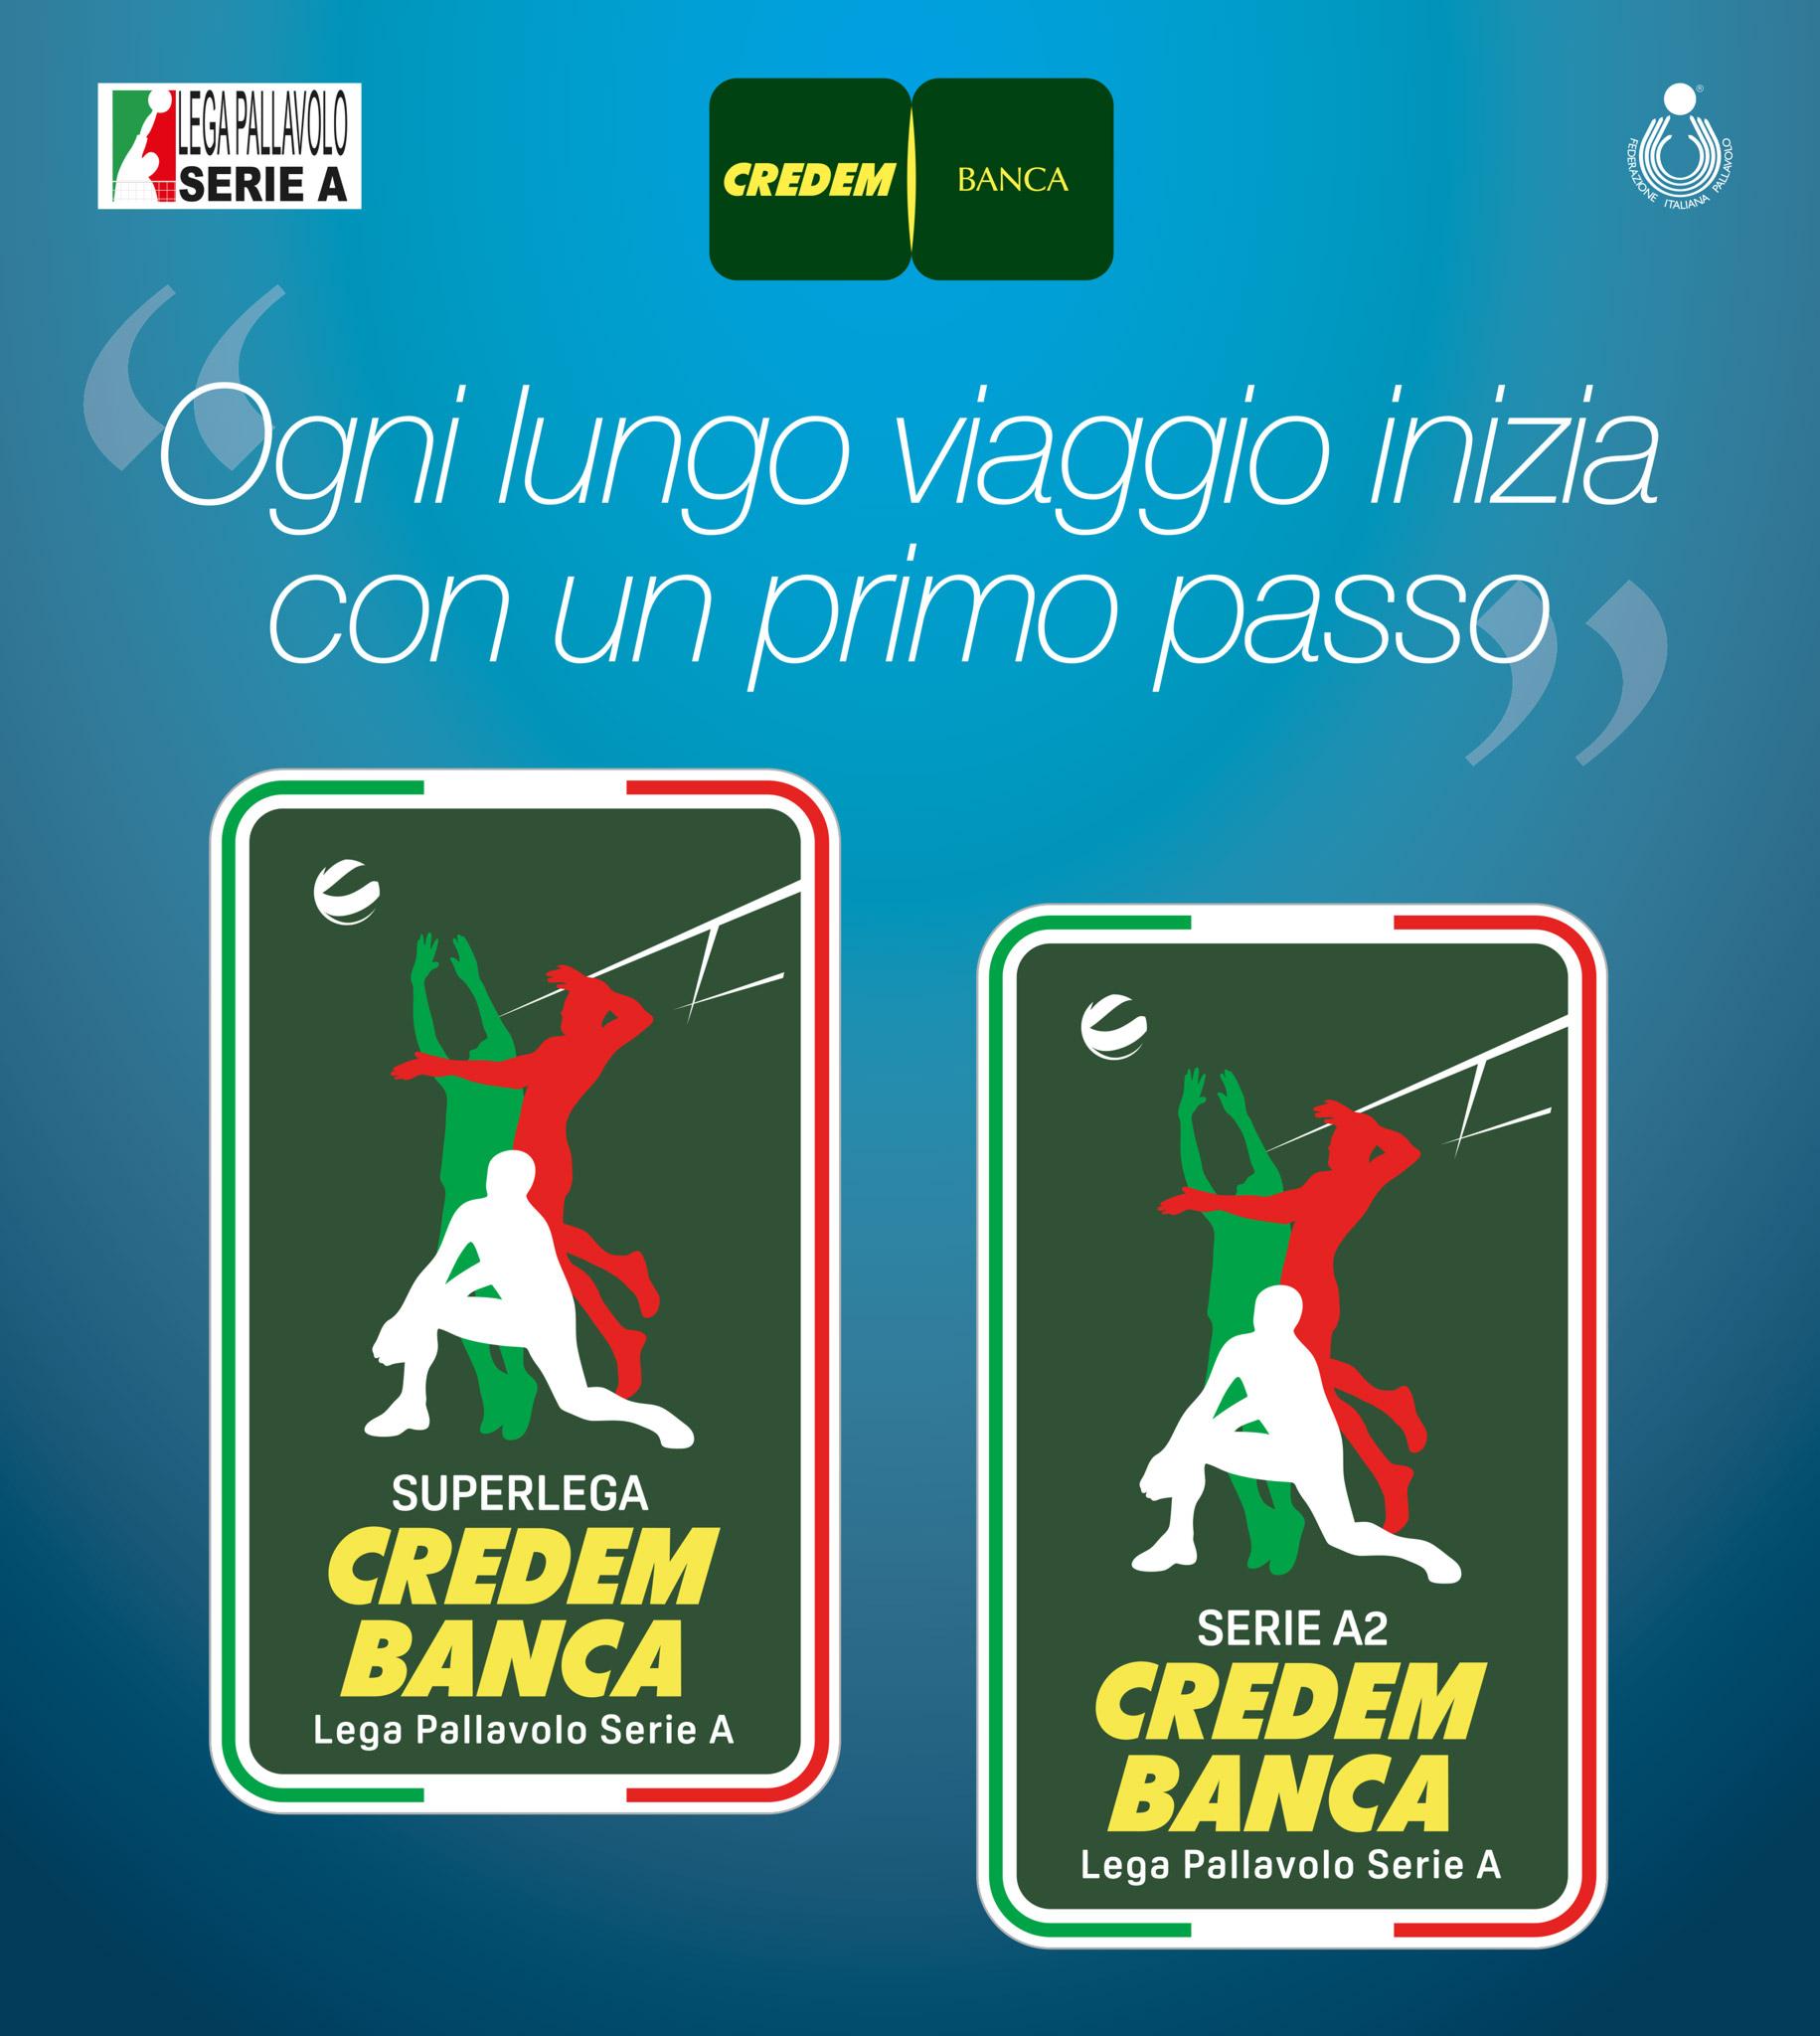 Nasce la Serie A Credem Banca